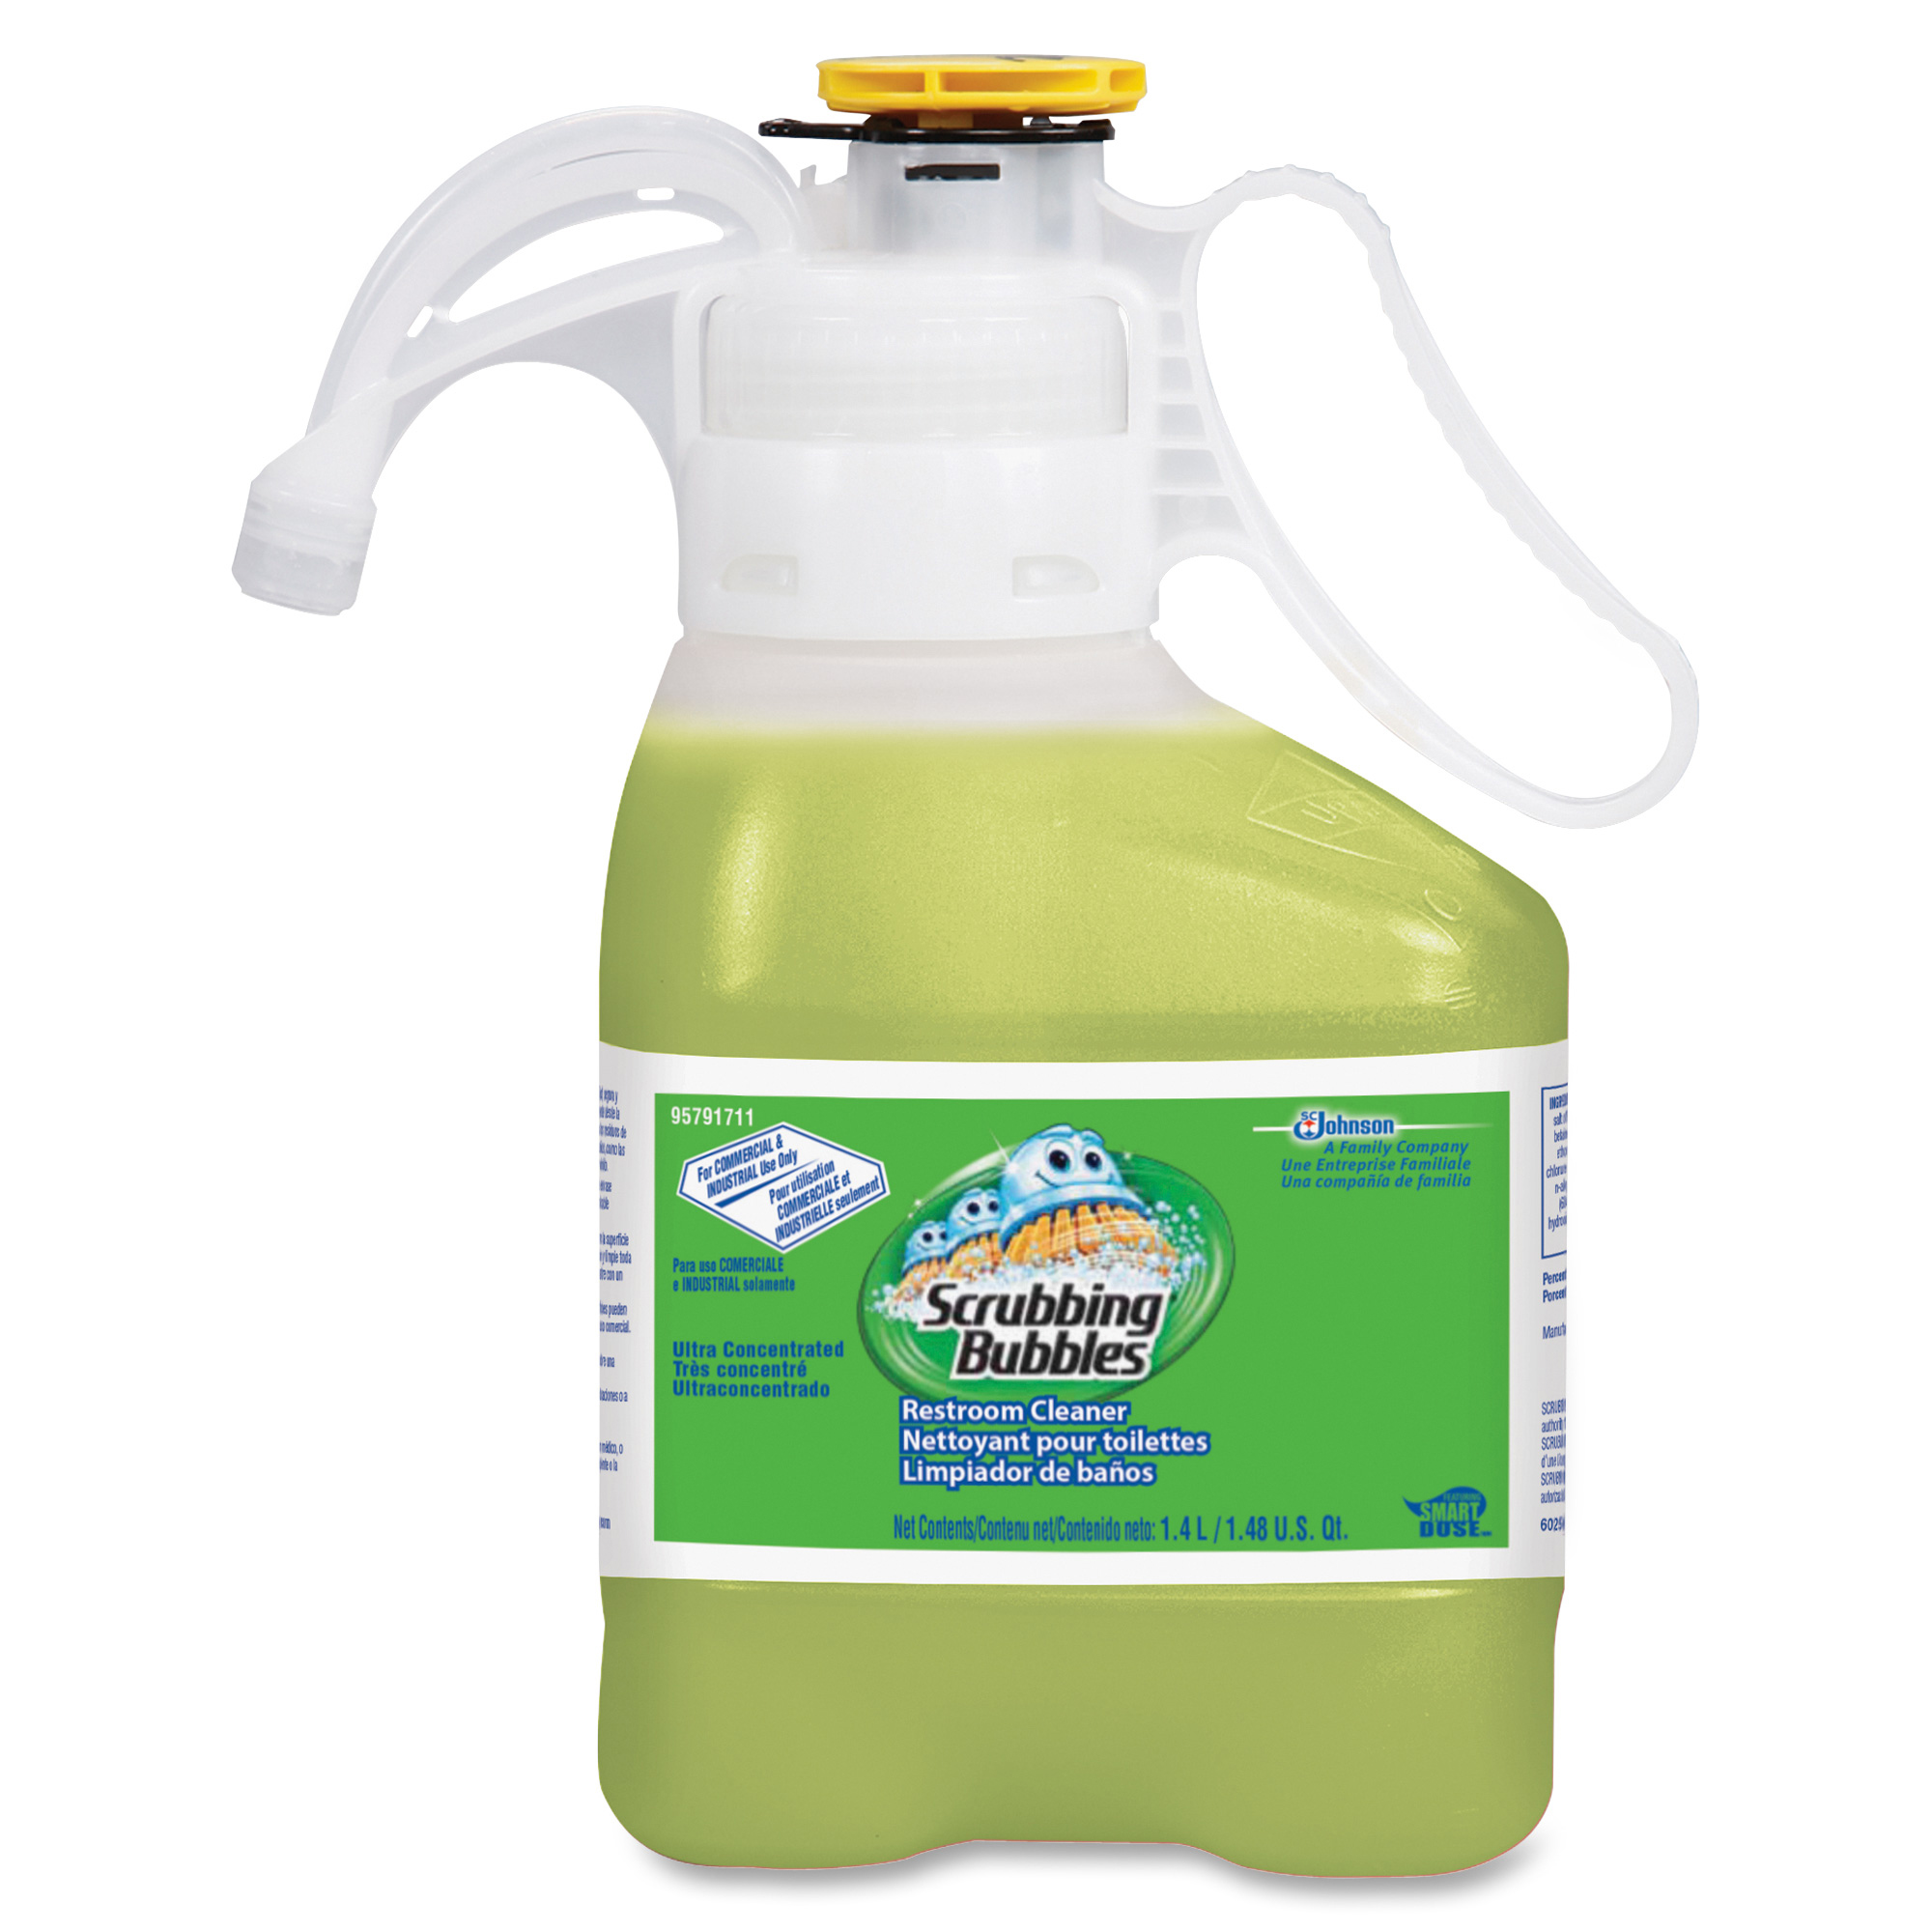 Scrubbing Bubbles Ultra Restrm Cleaner